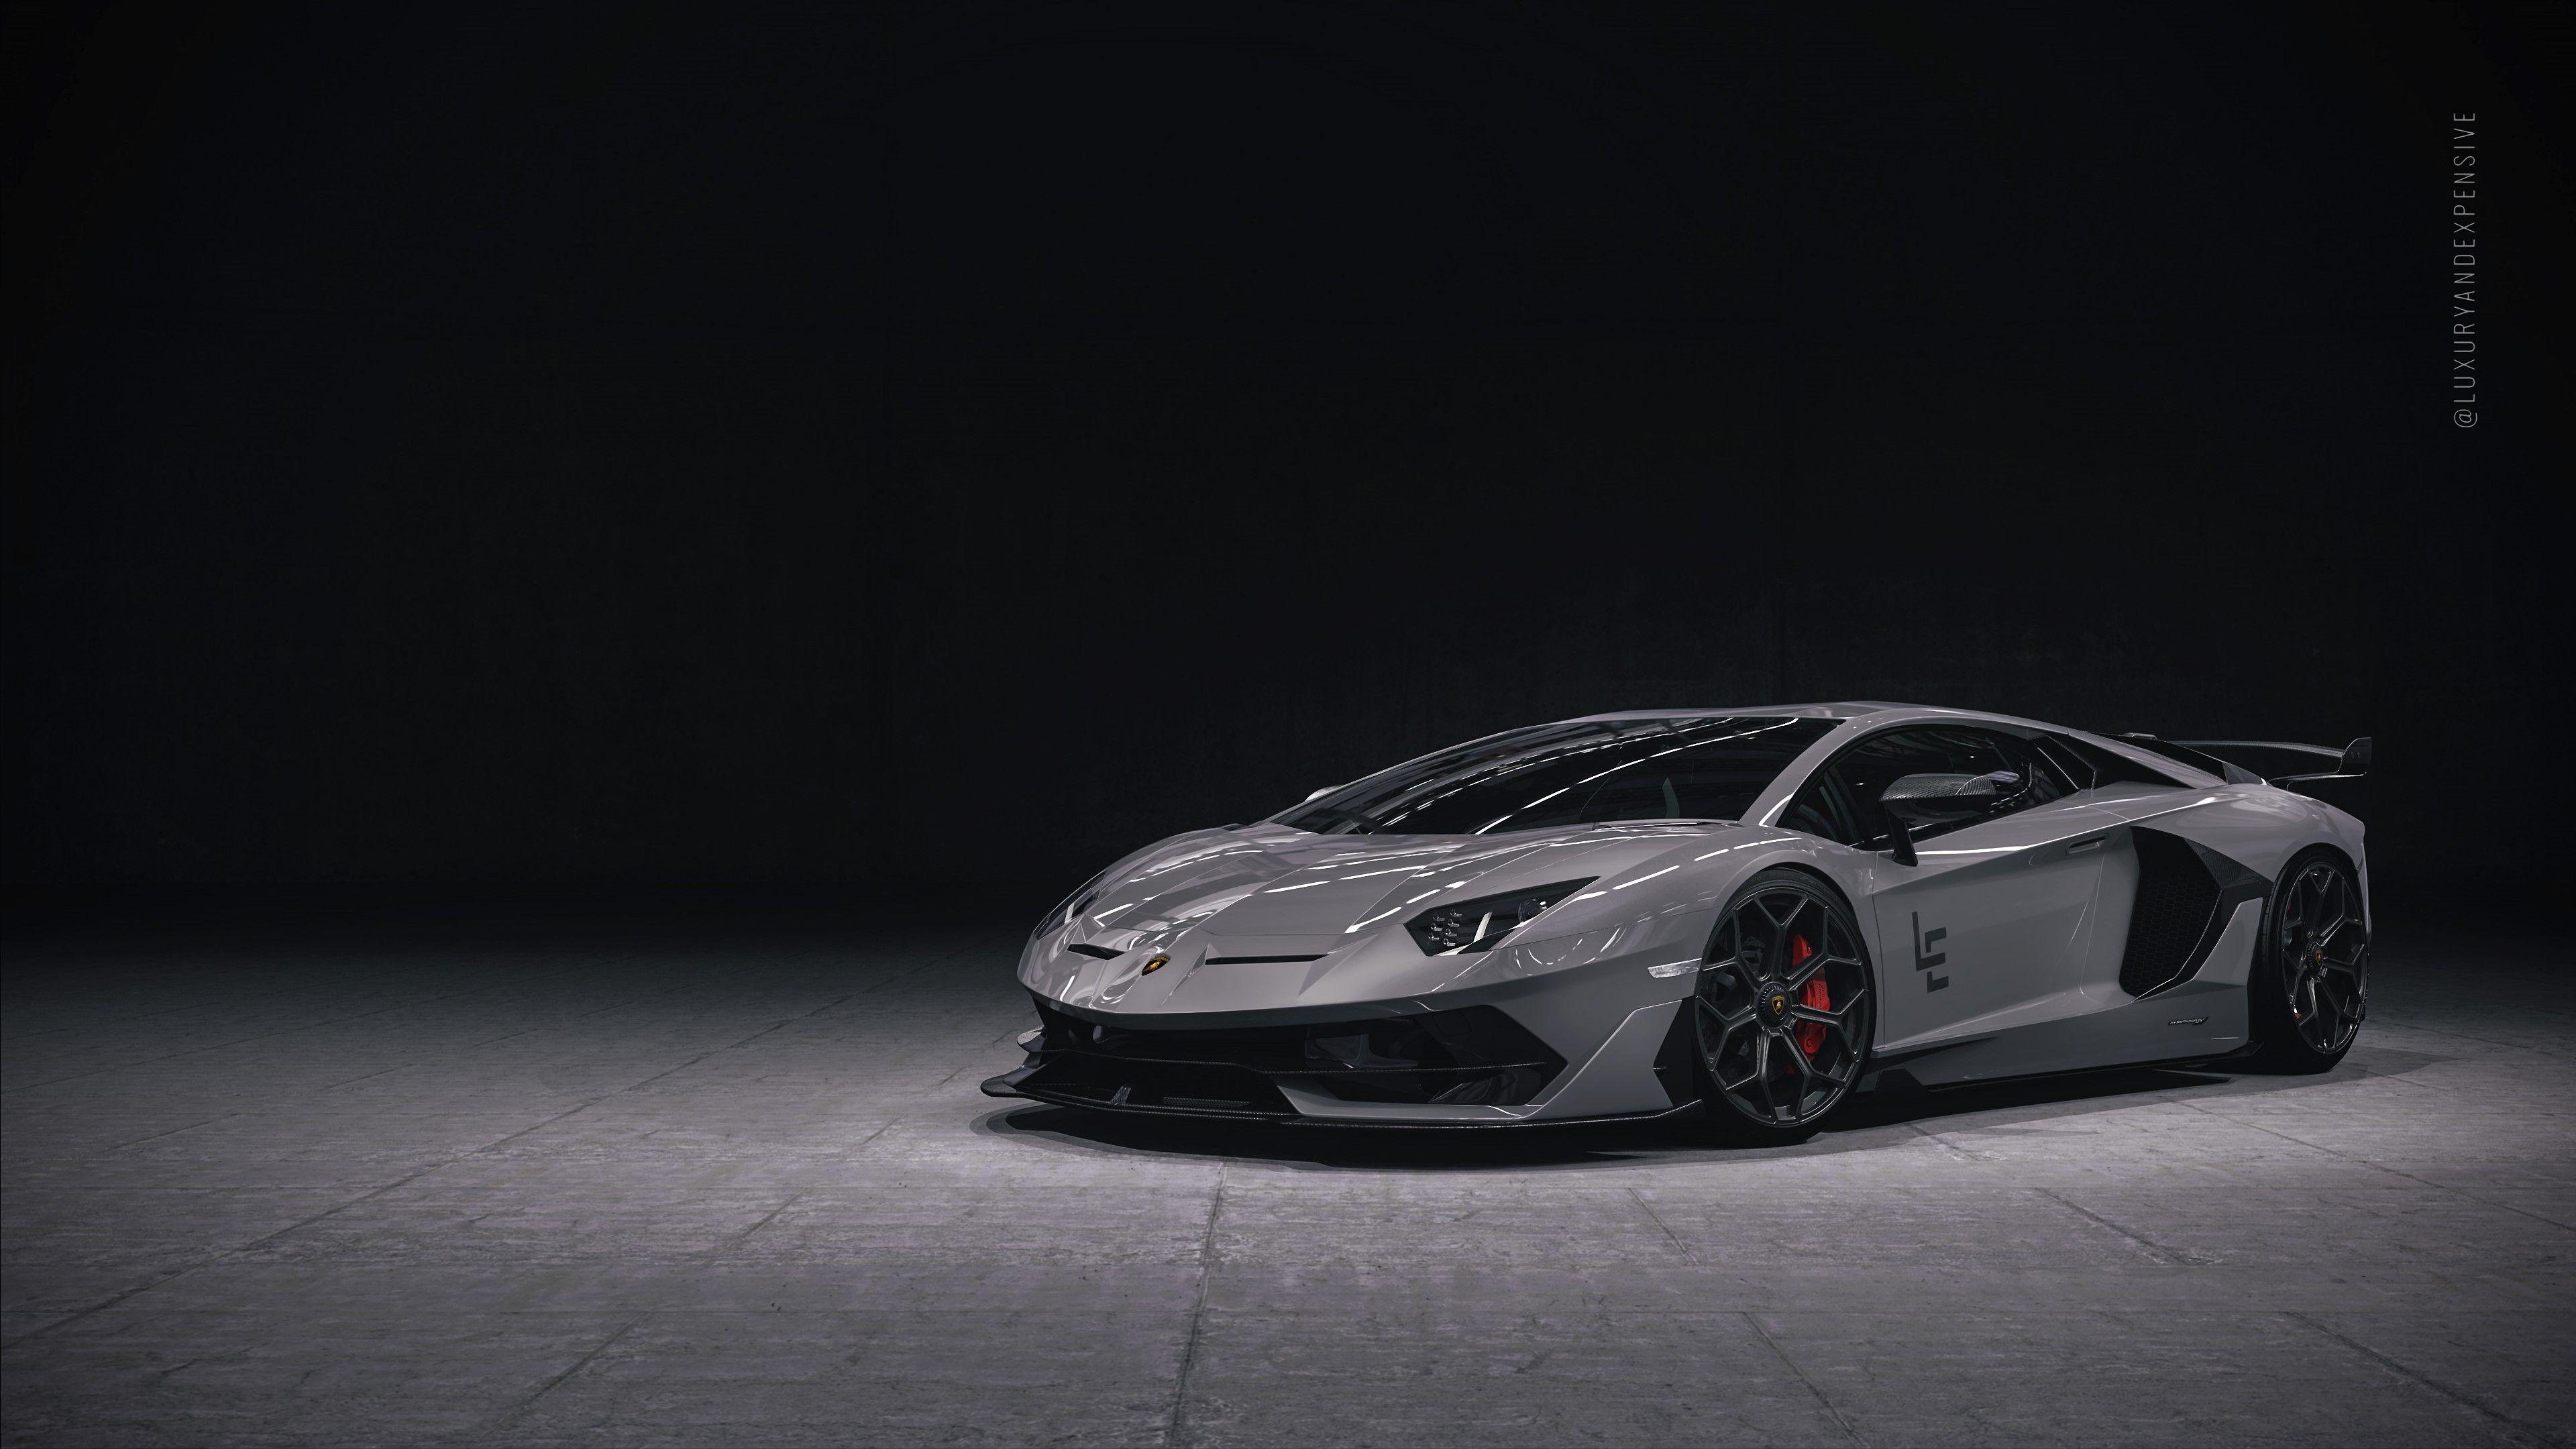 Black Lamborghini Aventador 4K HD Wallpapers - Wallpaper Cave